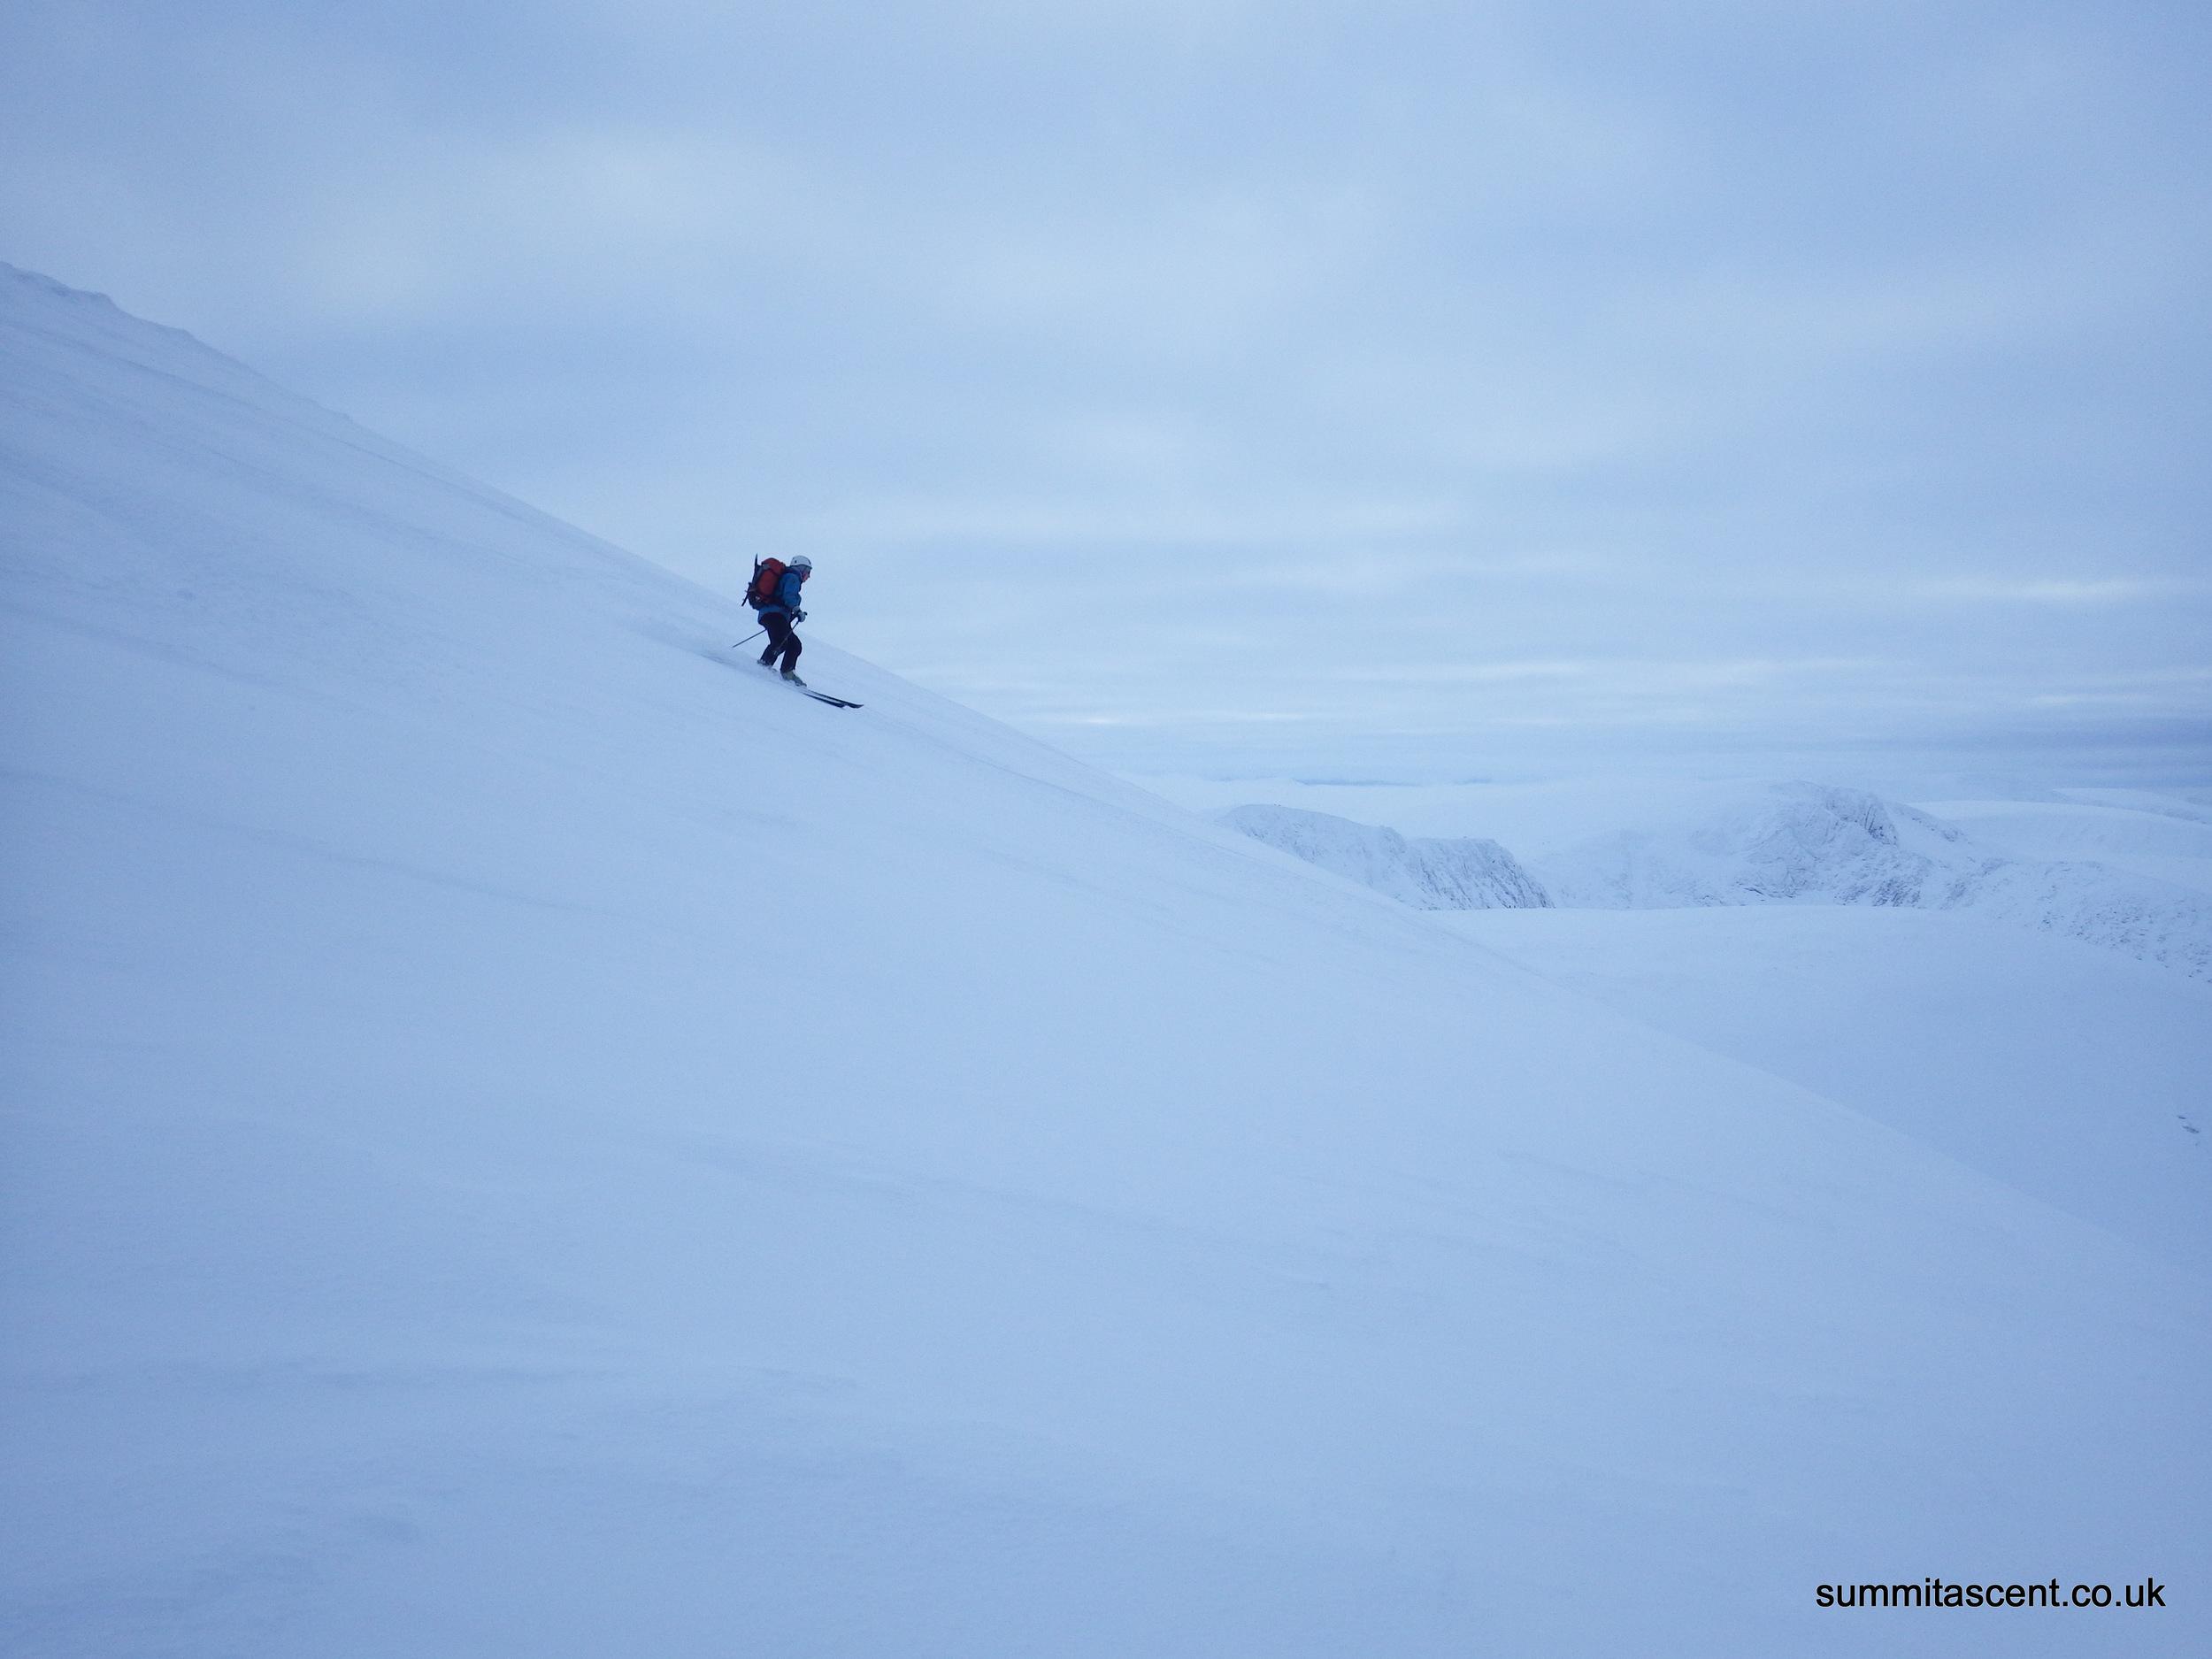 Mandy enjoying the ski down